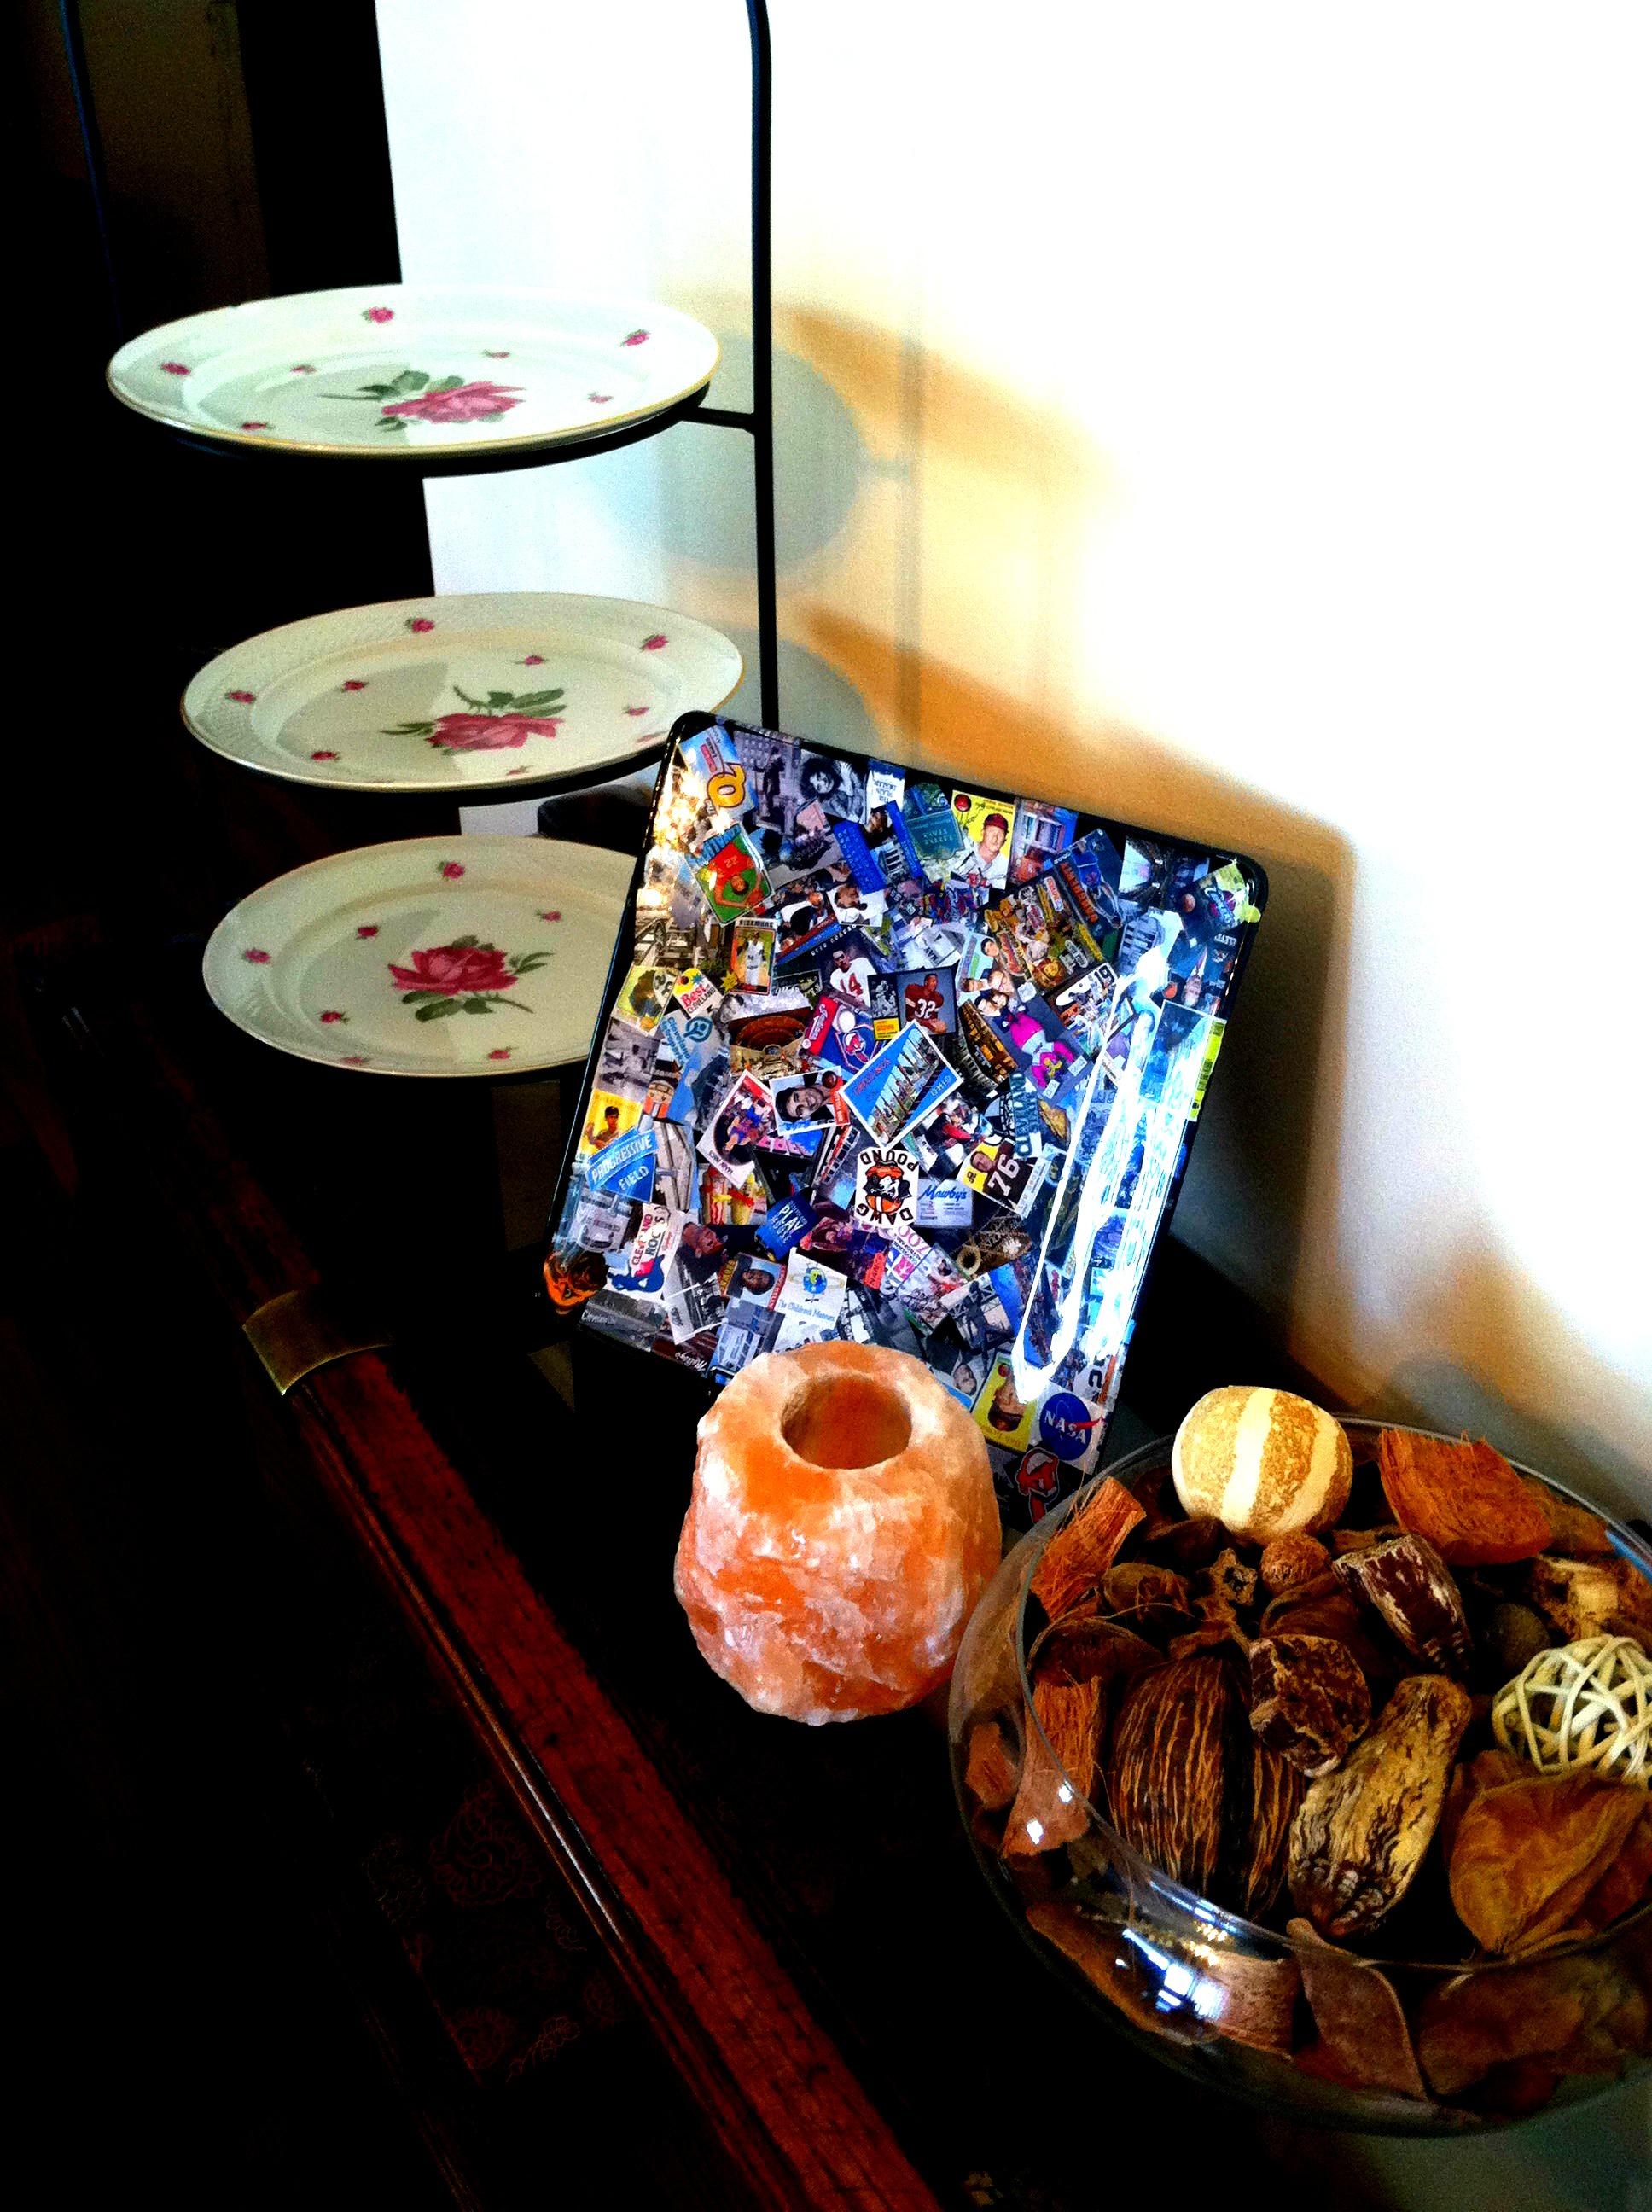 browns plate displayed